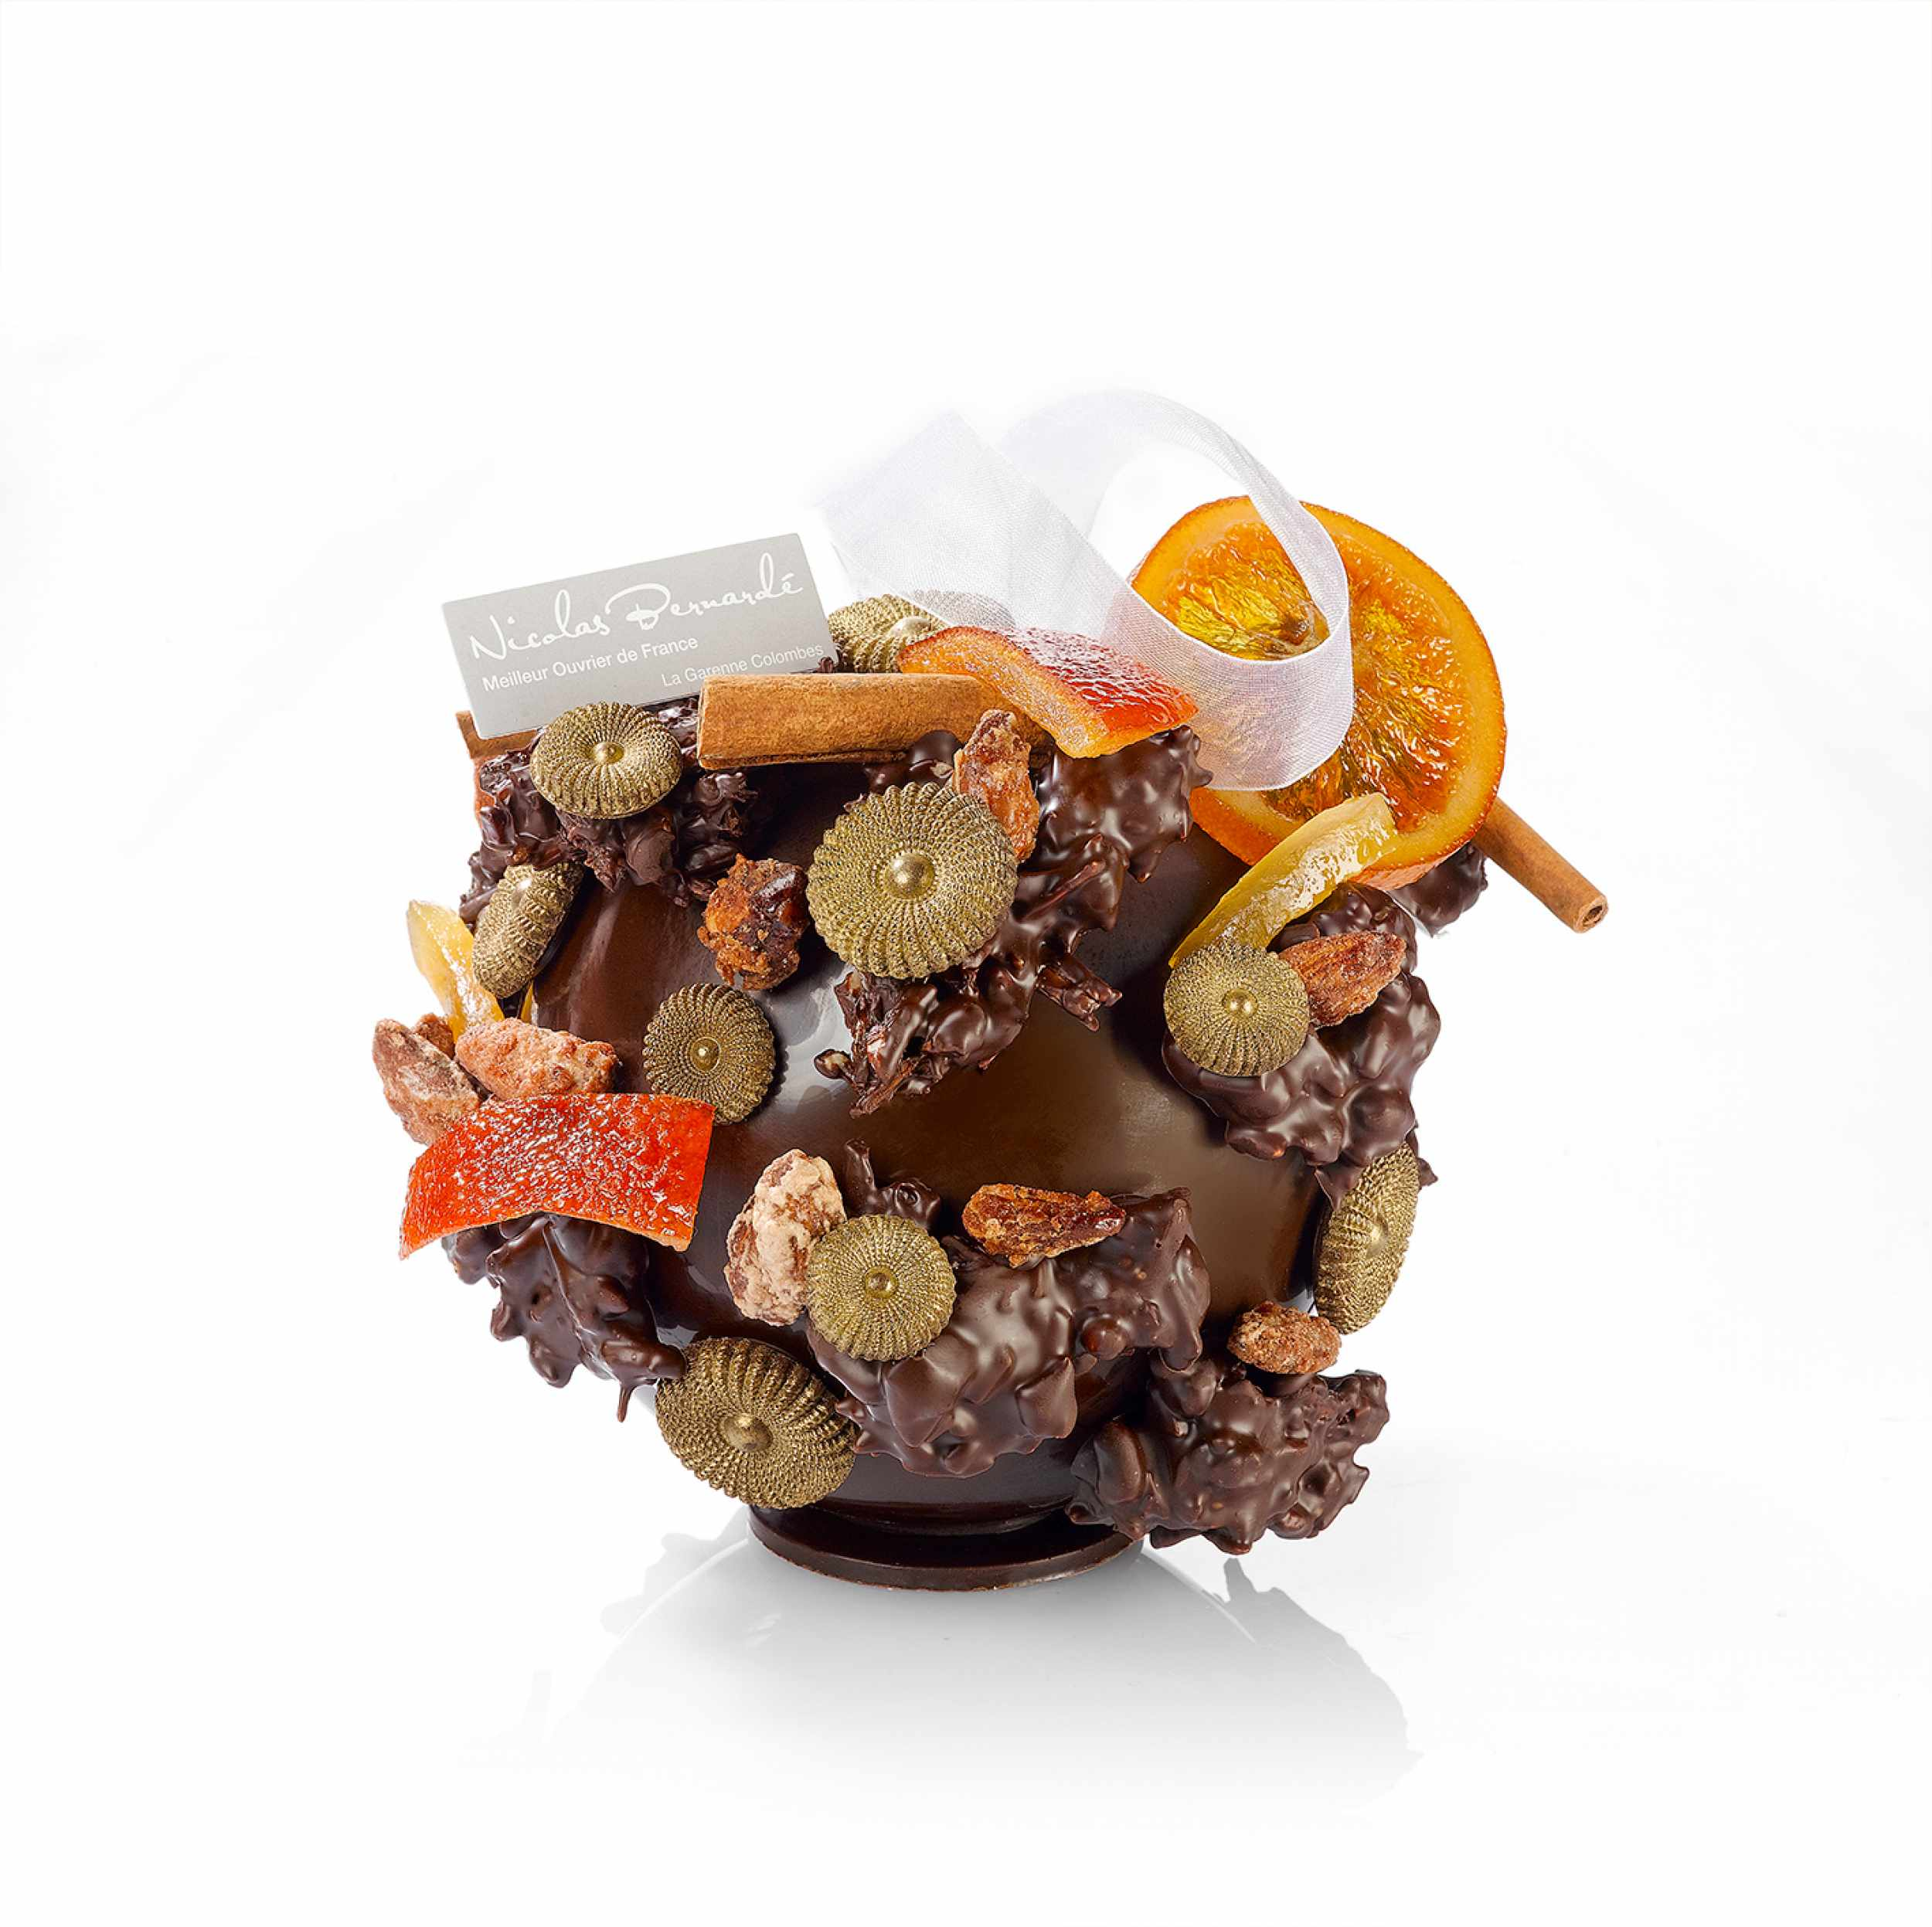 boule-chocolat-gourmand.jpg